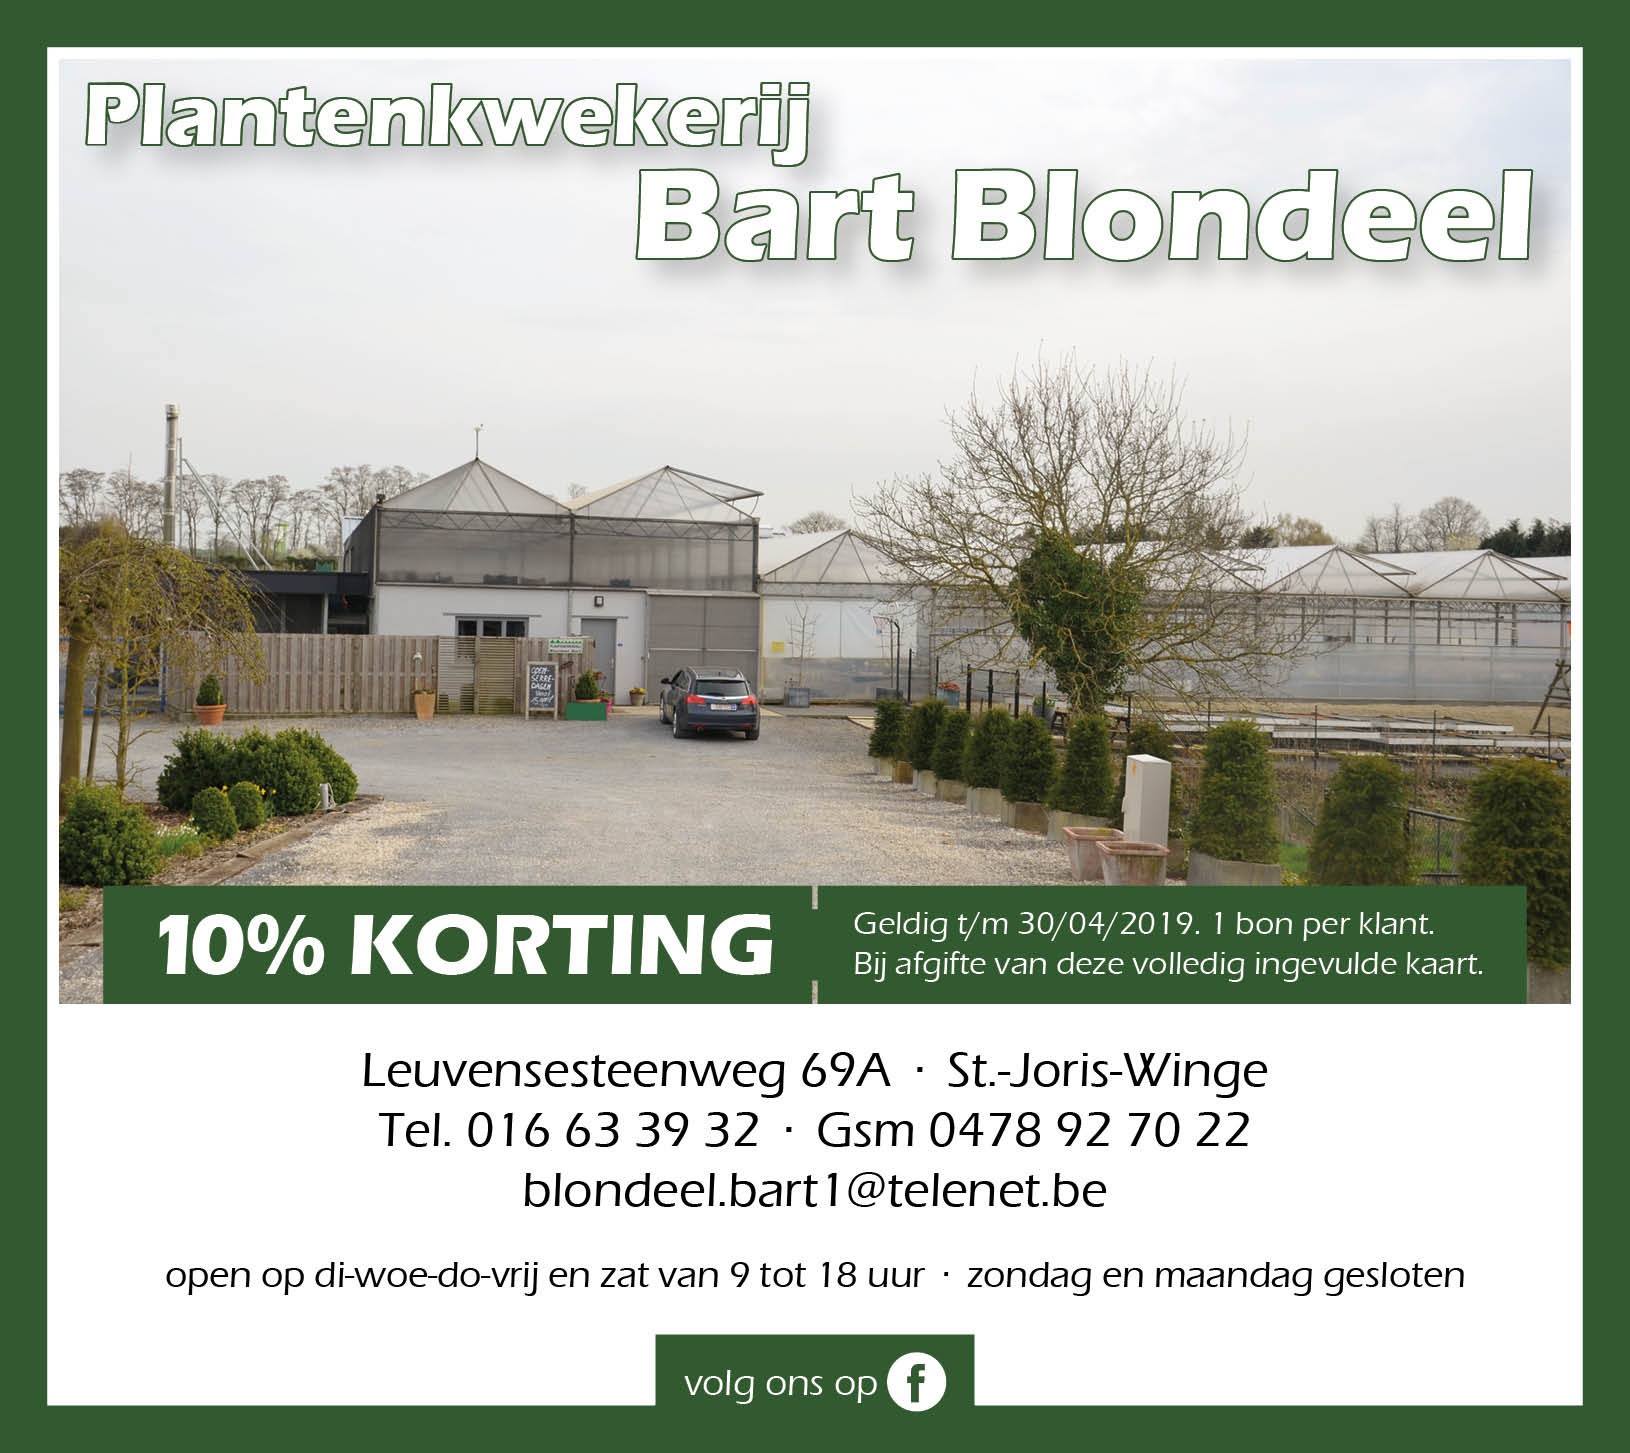 blondeel_plantenkwekerij_sintjoriswinge_maart_2019.jpg